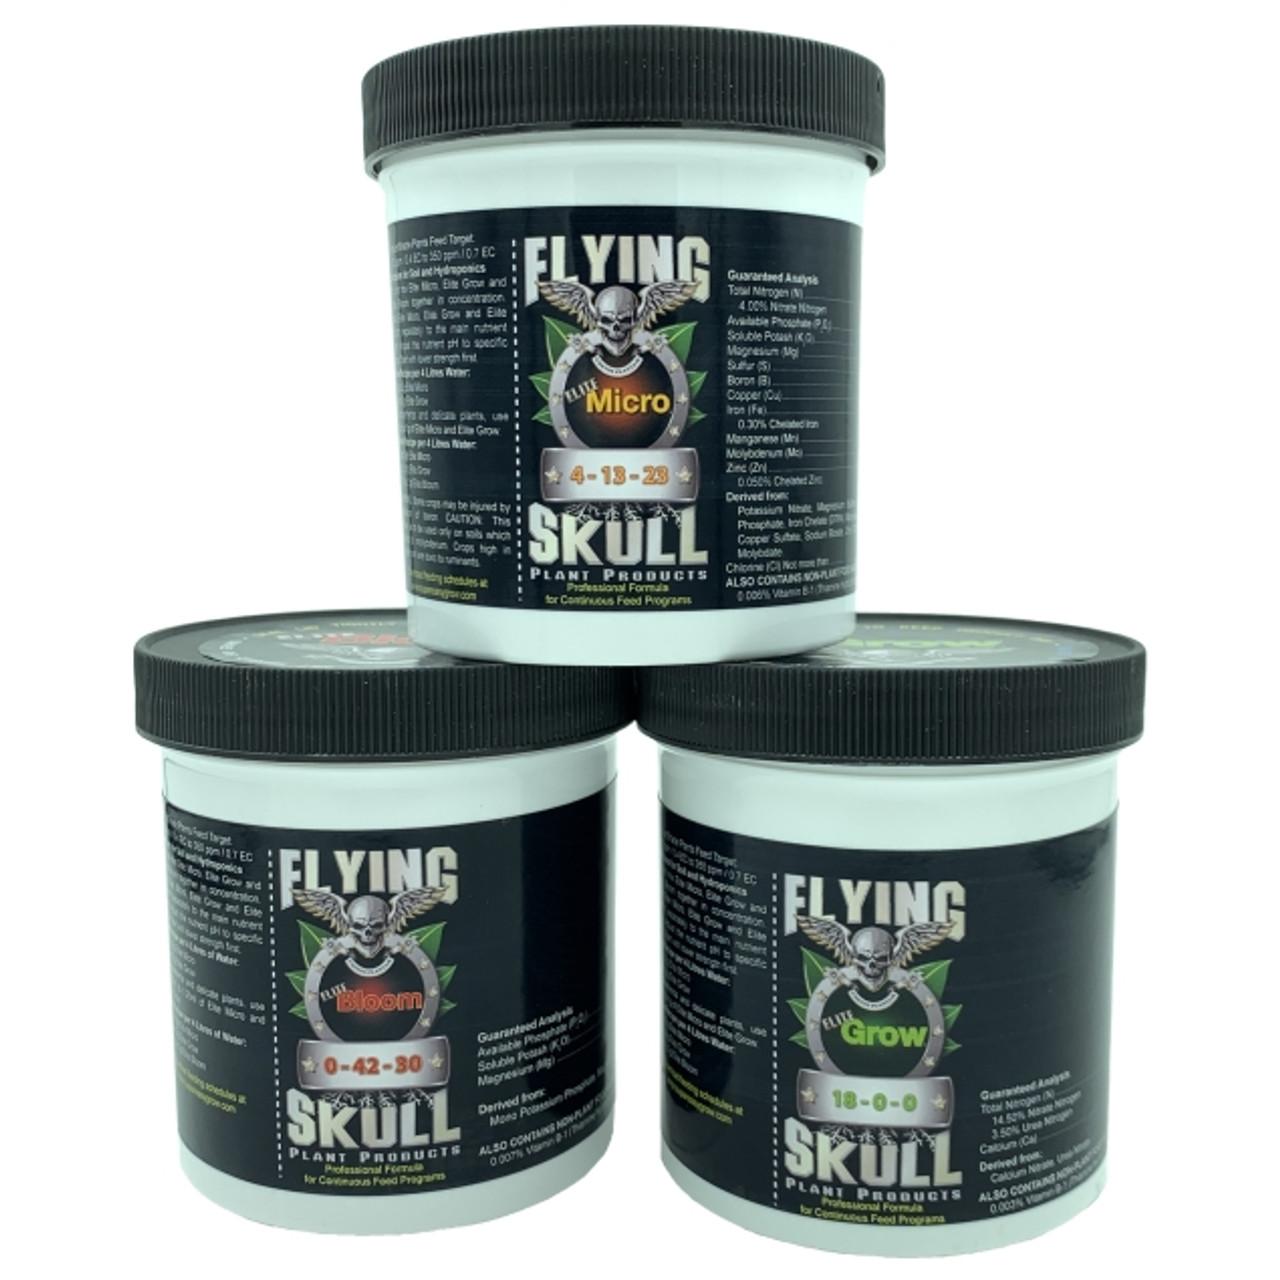 Flying Skull Elite Plant Foods Range - Elite Micro, Elite Bloom, Elite Grow